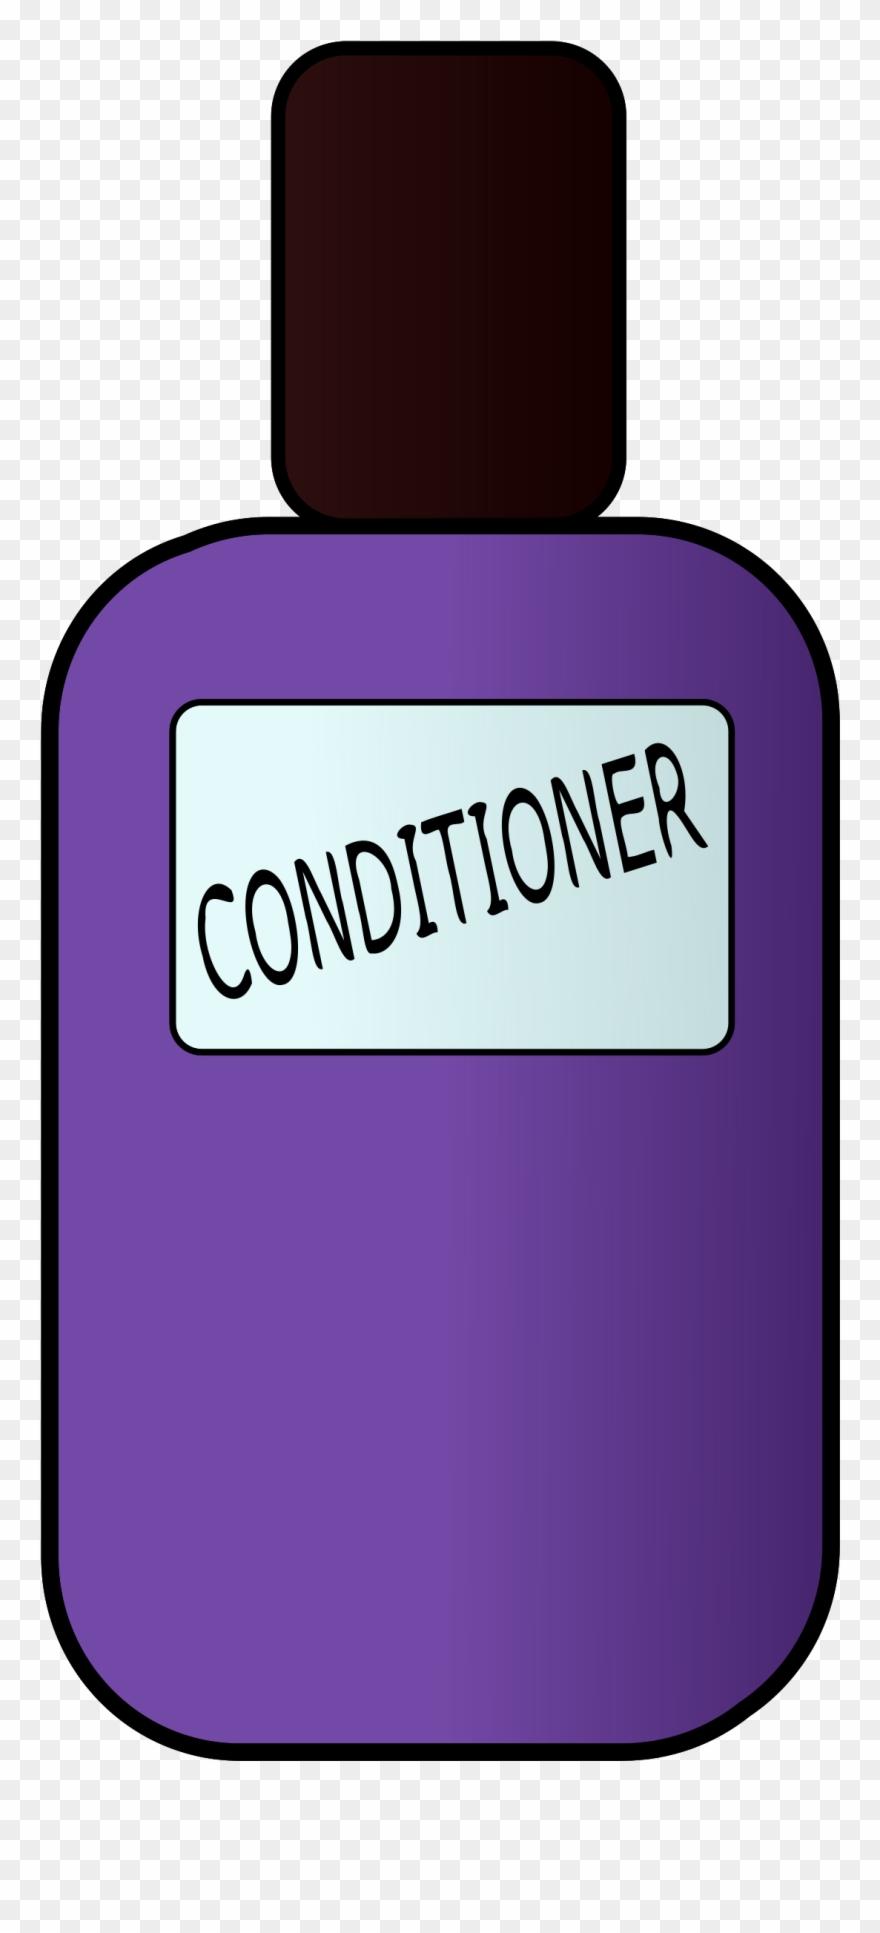 Clipart Conditioner Big Image.